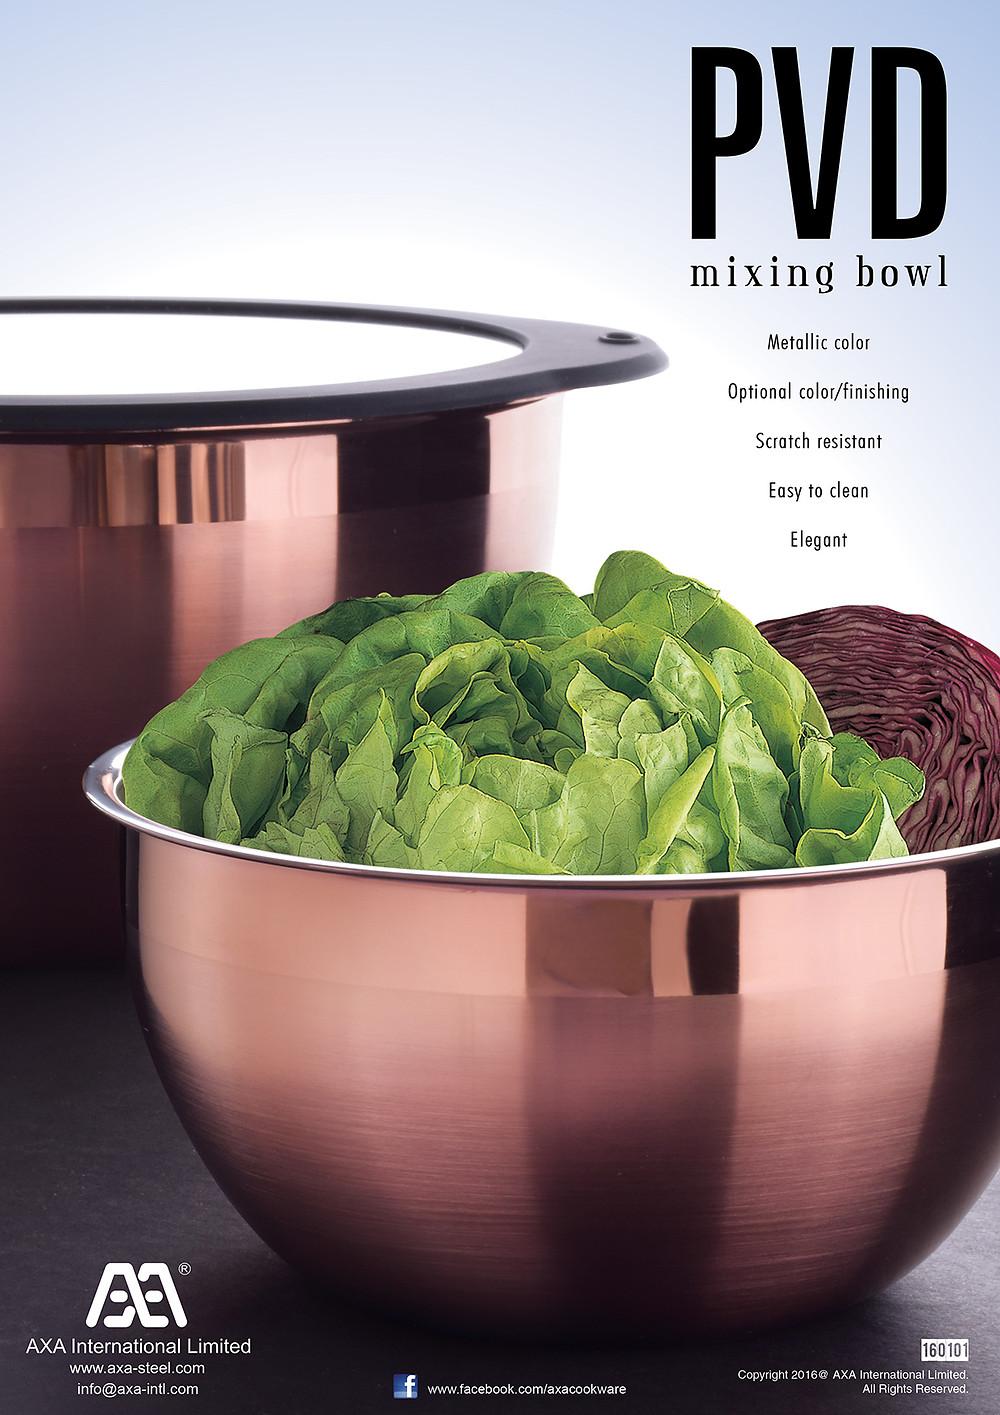 PVD Mixing bowl